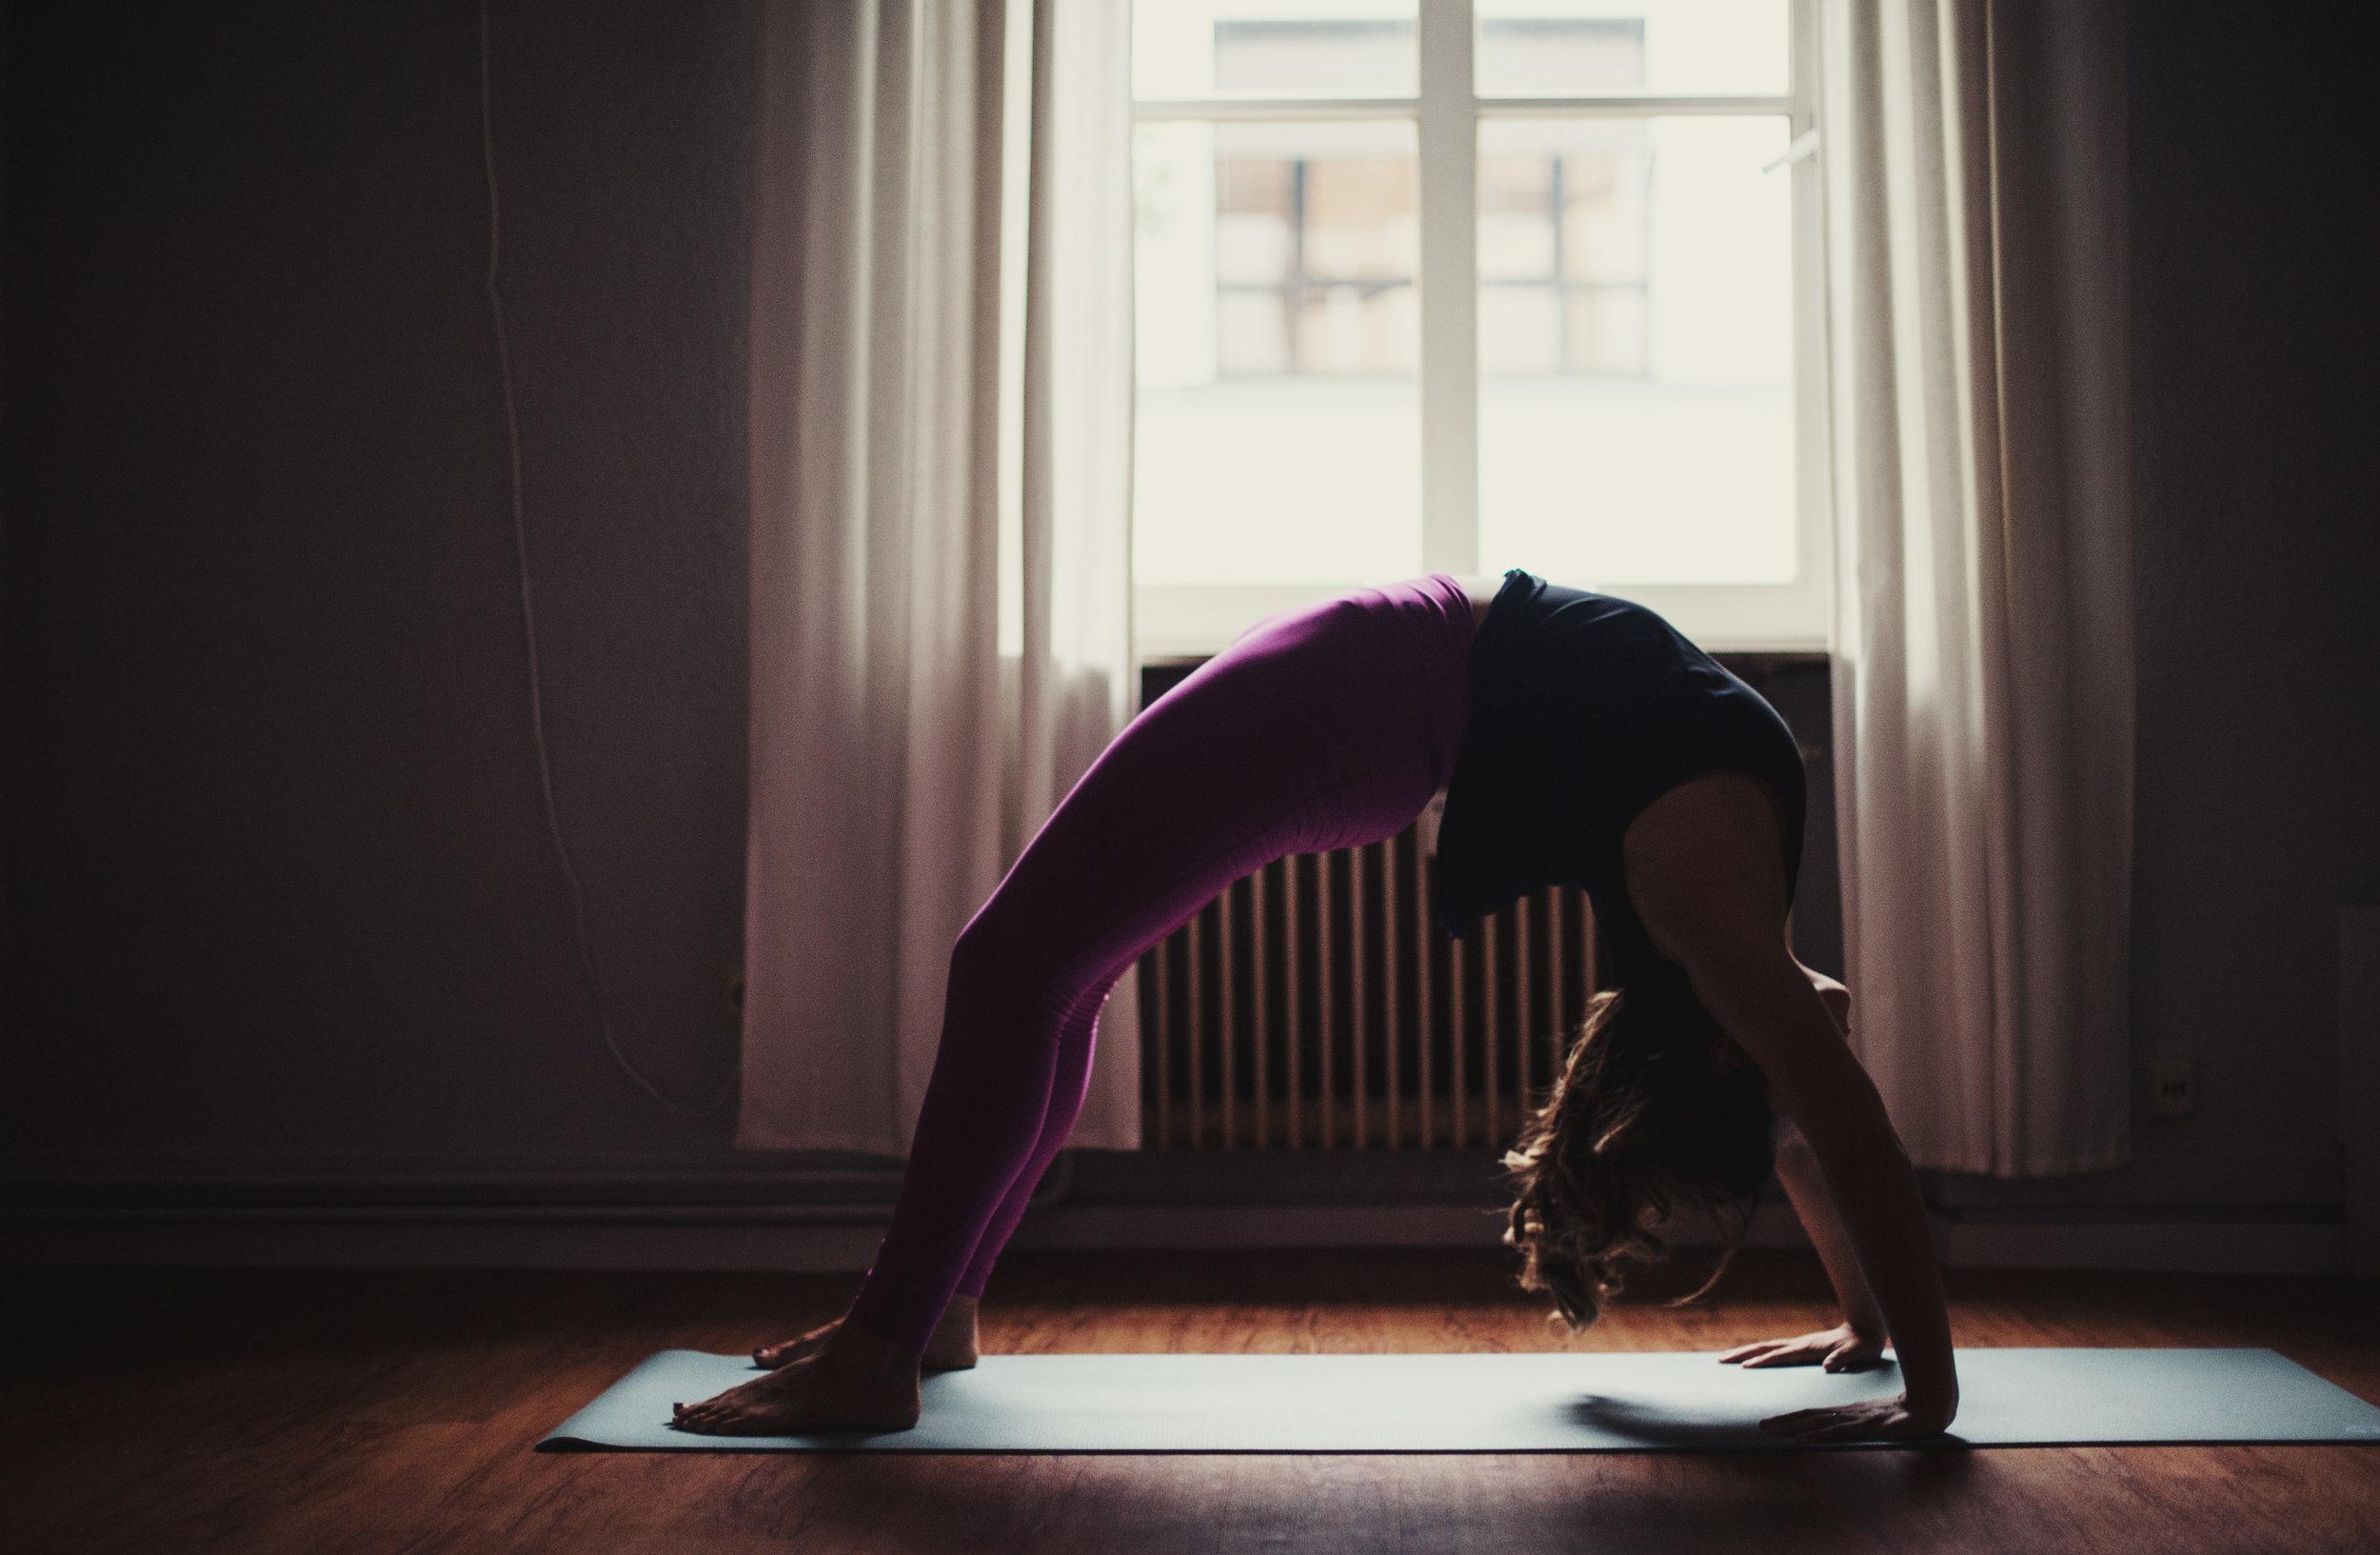 yoga-picture-the-vinyasa-people-katy-scherer-9.jpg